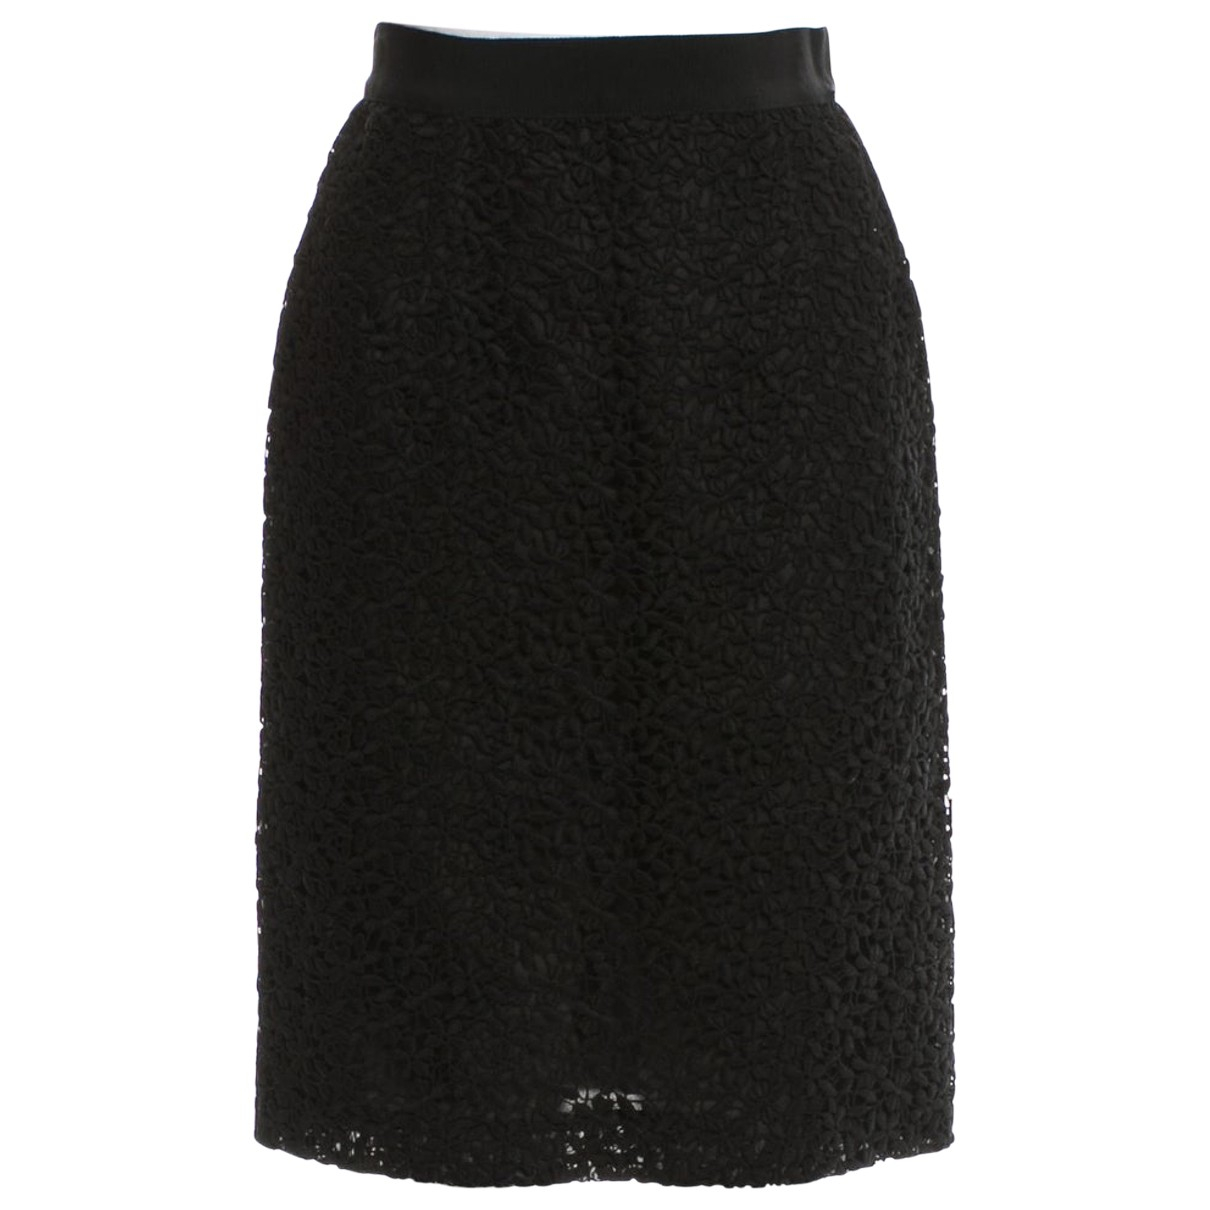 Giambattista Valli \N Black Cotton skirt for Women 40 IT